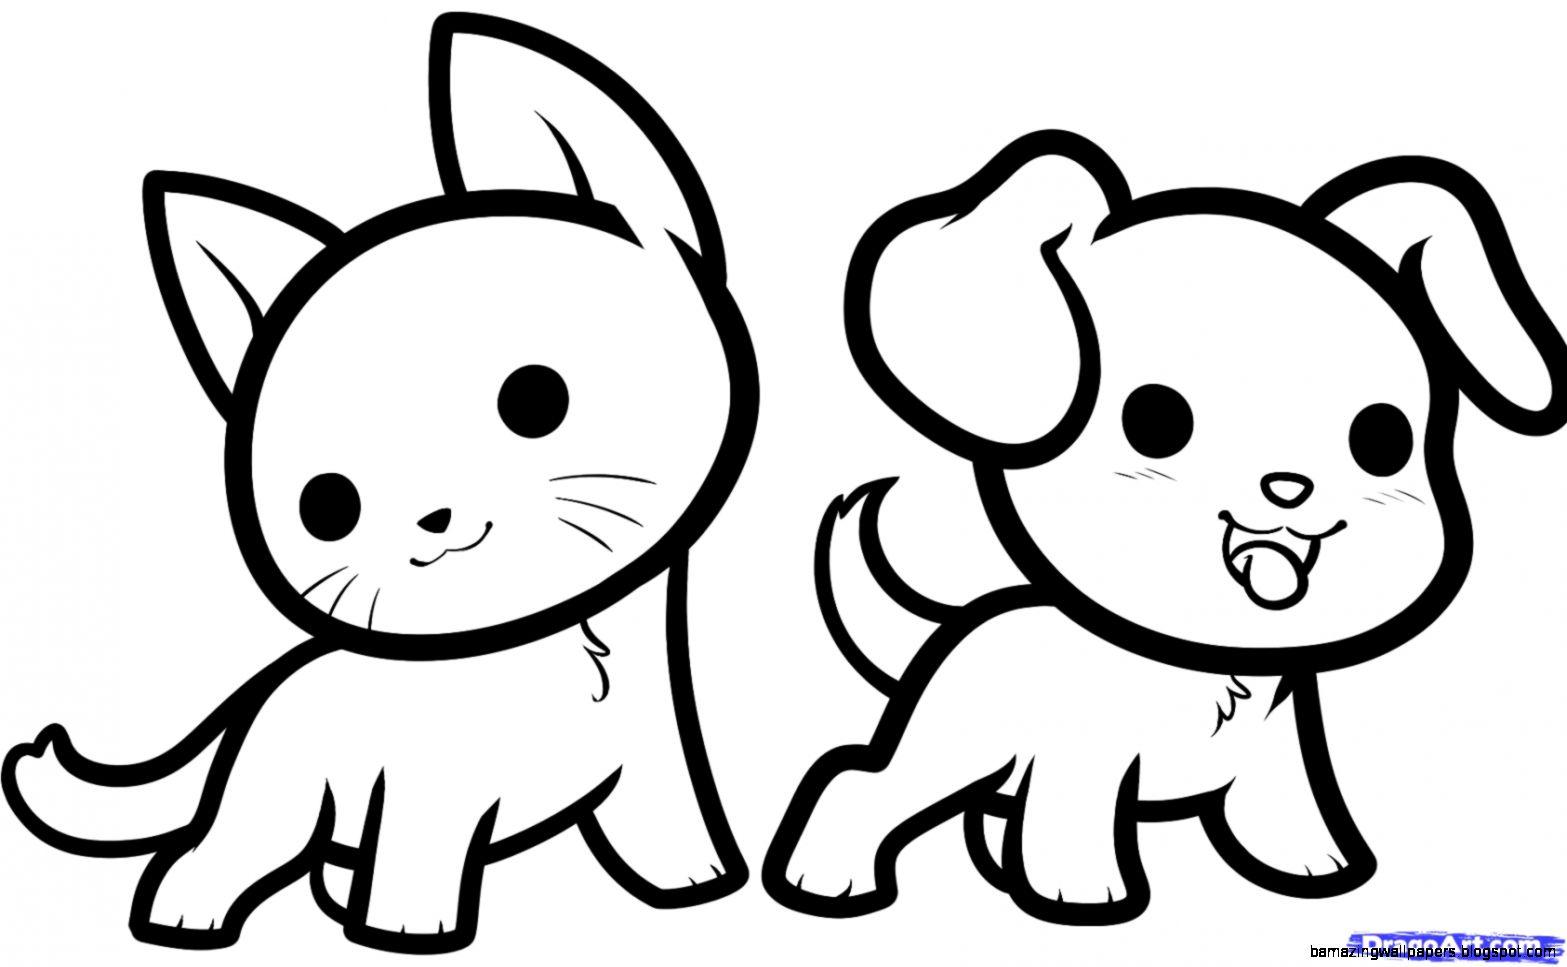 Cute Animal Drawings For Kids